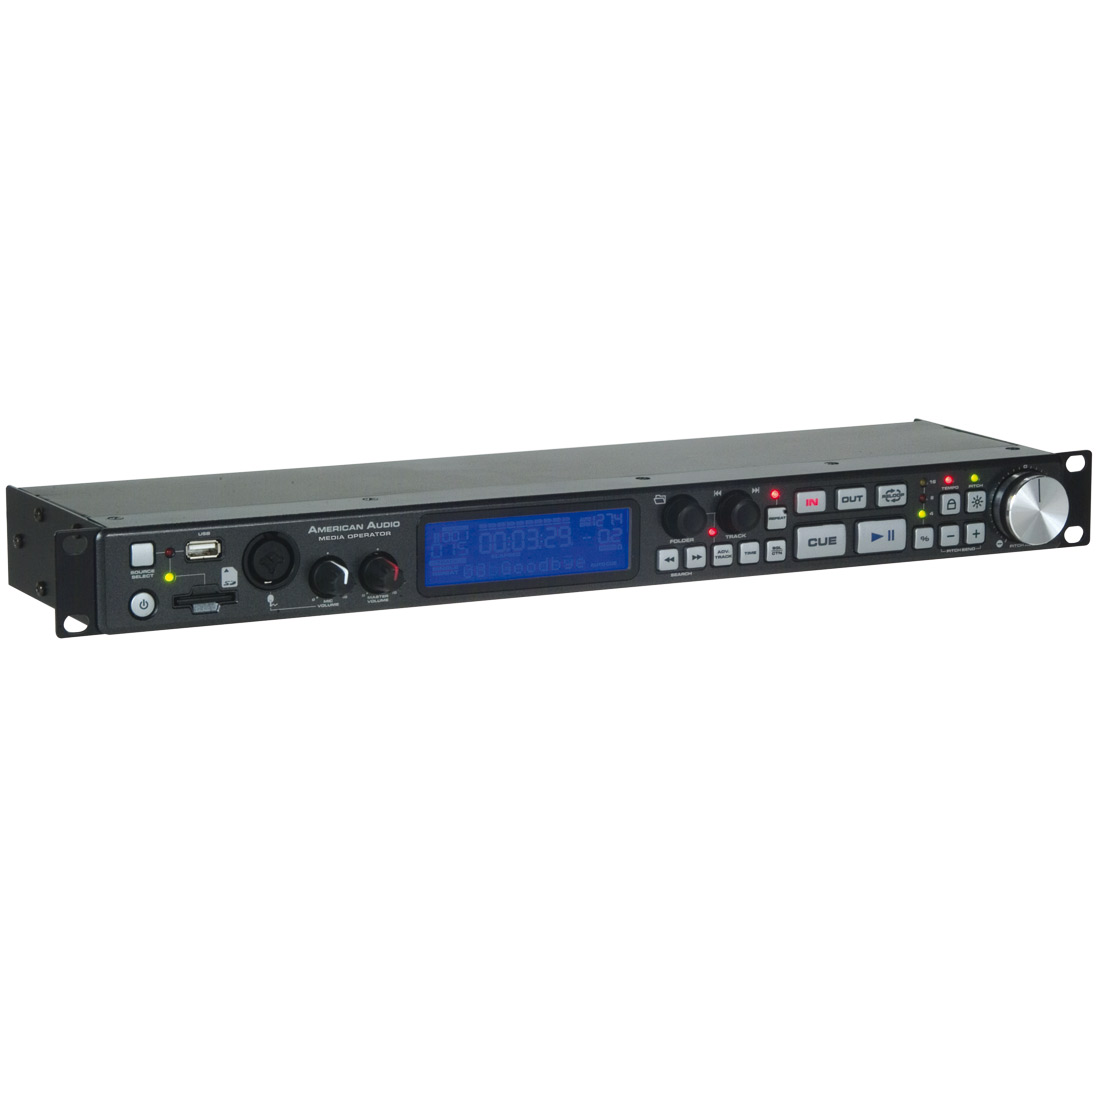 Media Operator - 1U rackmount SD/USB pla